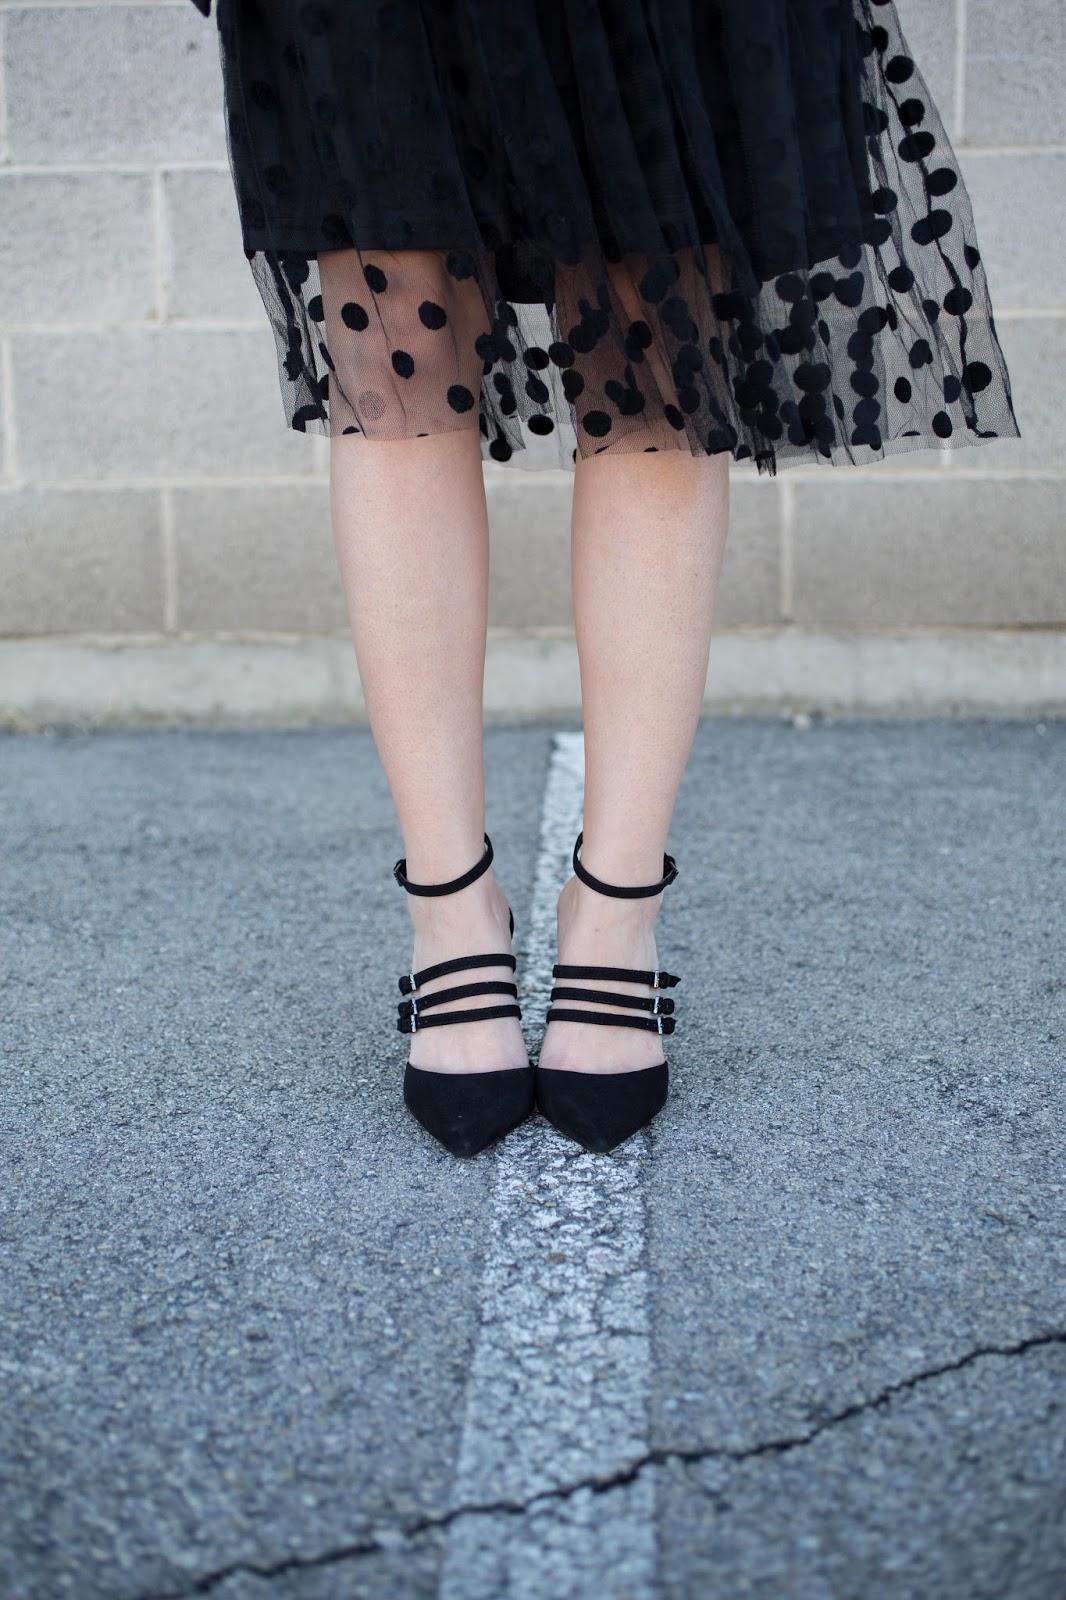 Polka Dots and Strappy Heels